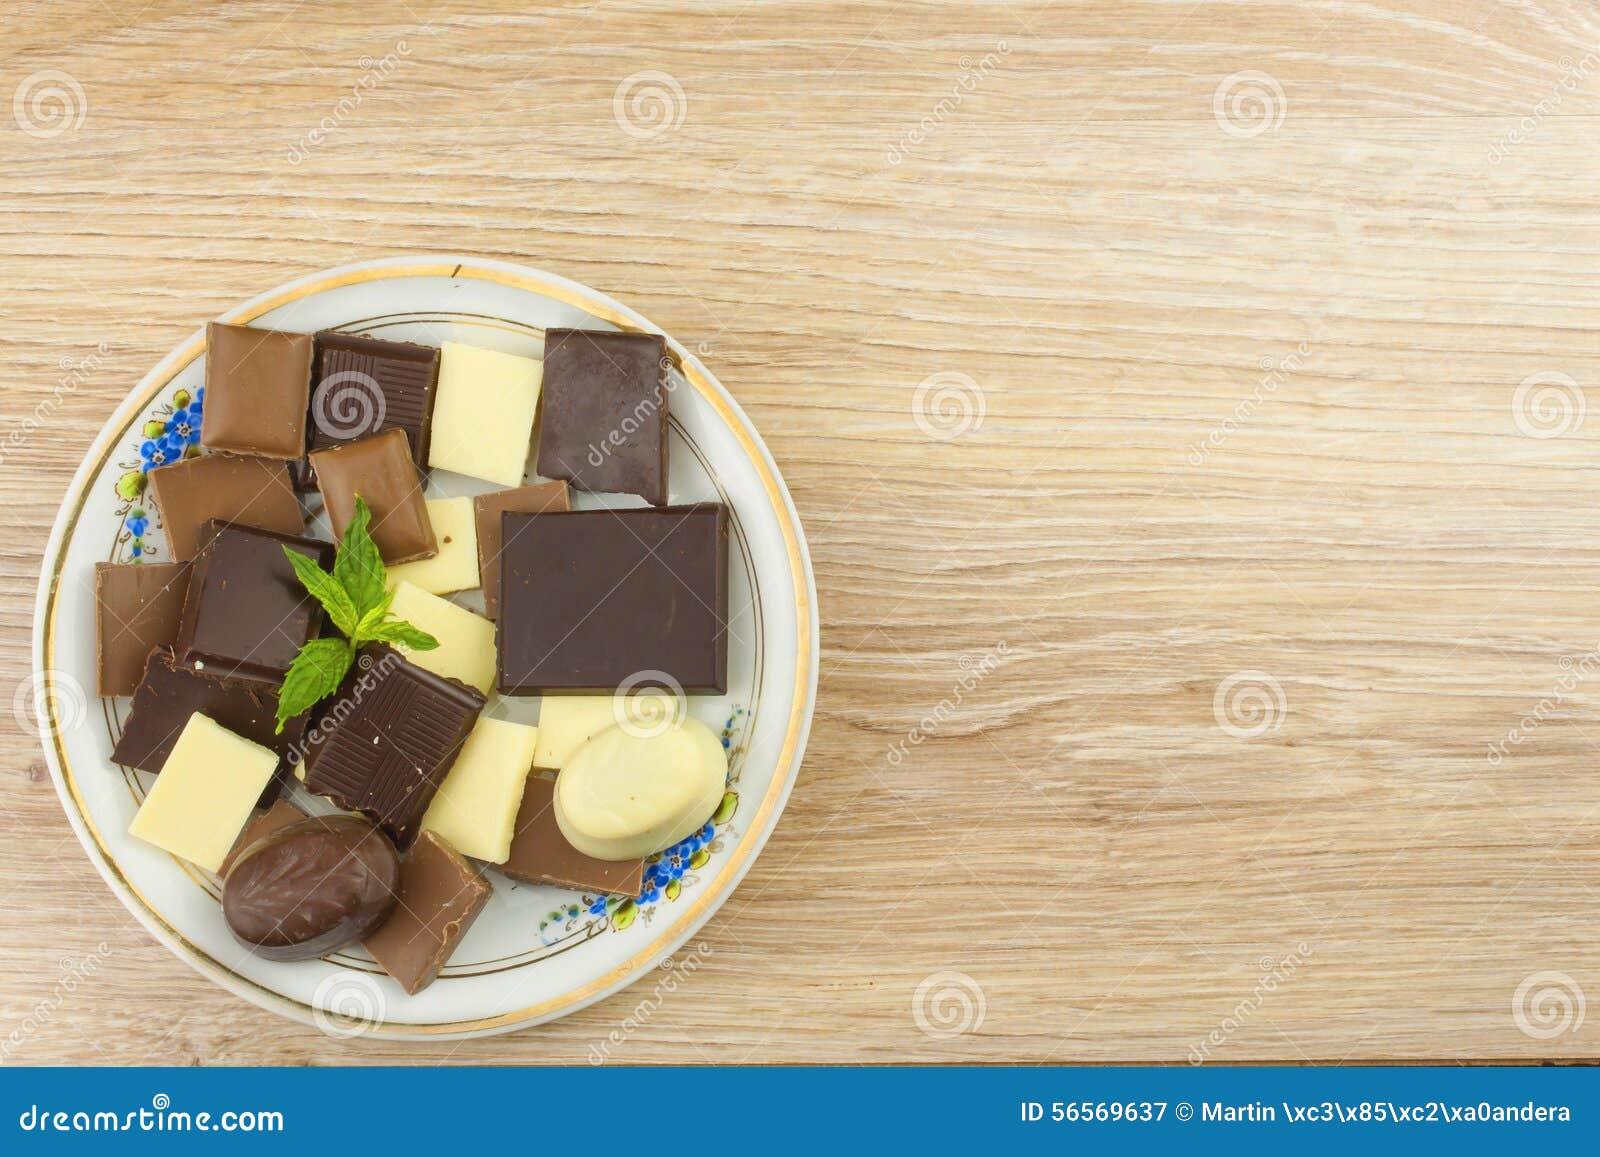 Download Κομμάτια της σοκολάτας σε έναν ξύλινο πίνακα Στοκ Εικόνα - εικόνα από καραμέλα, αδελφών: 56569637